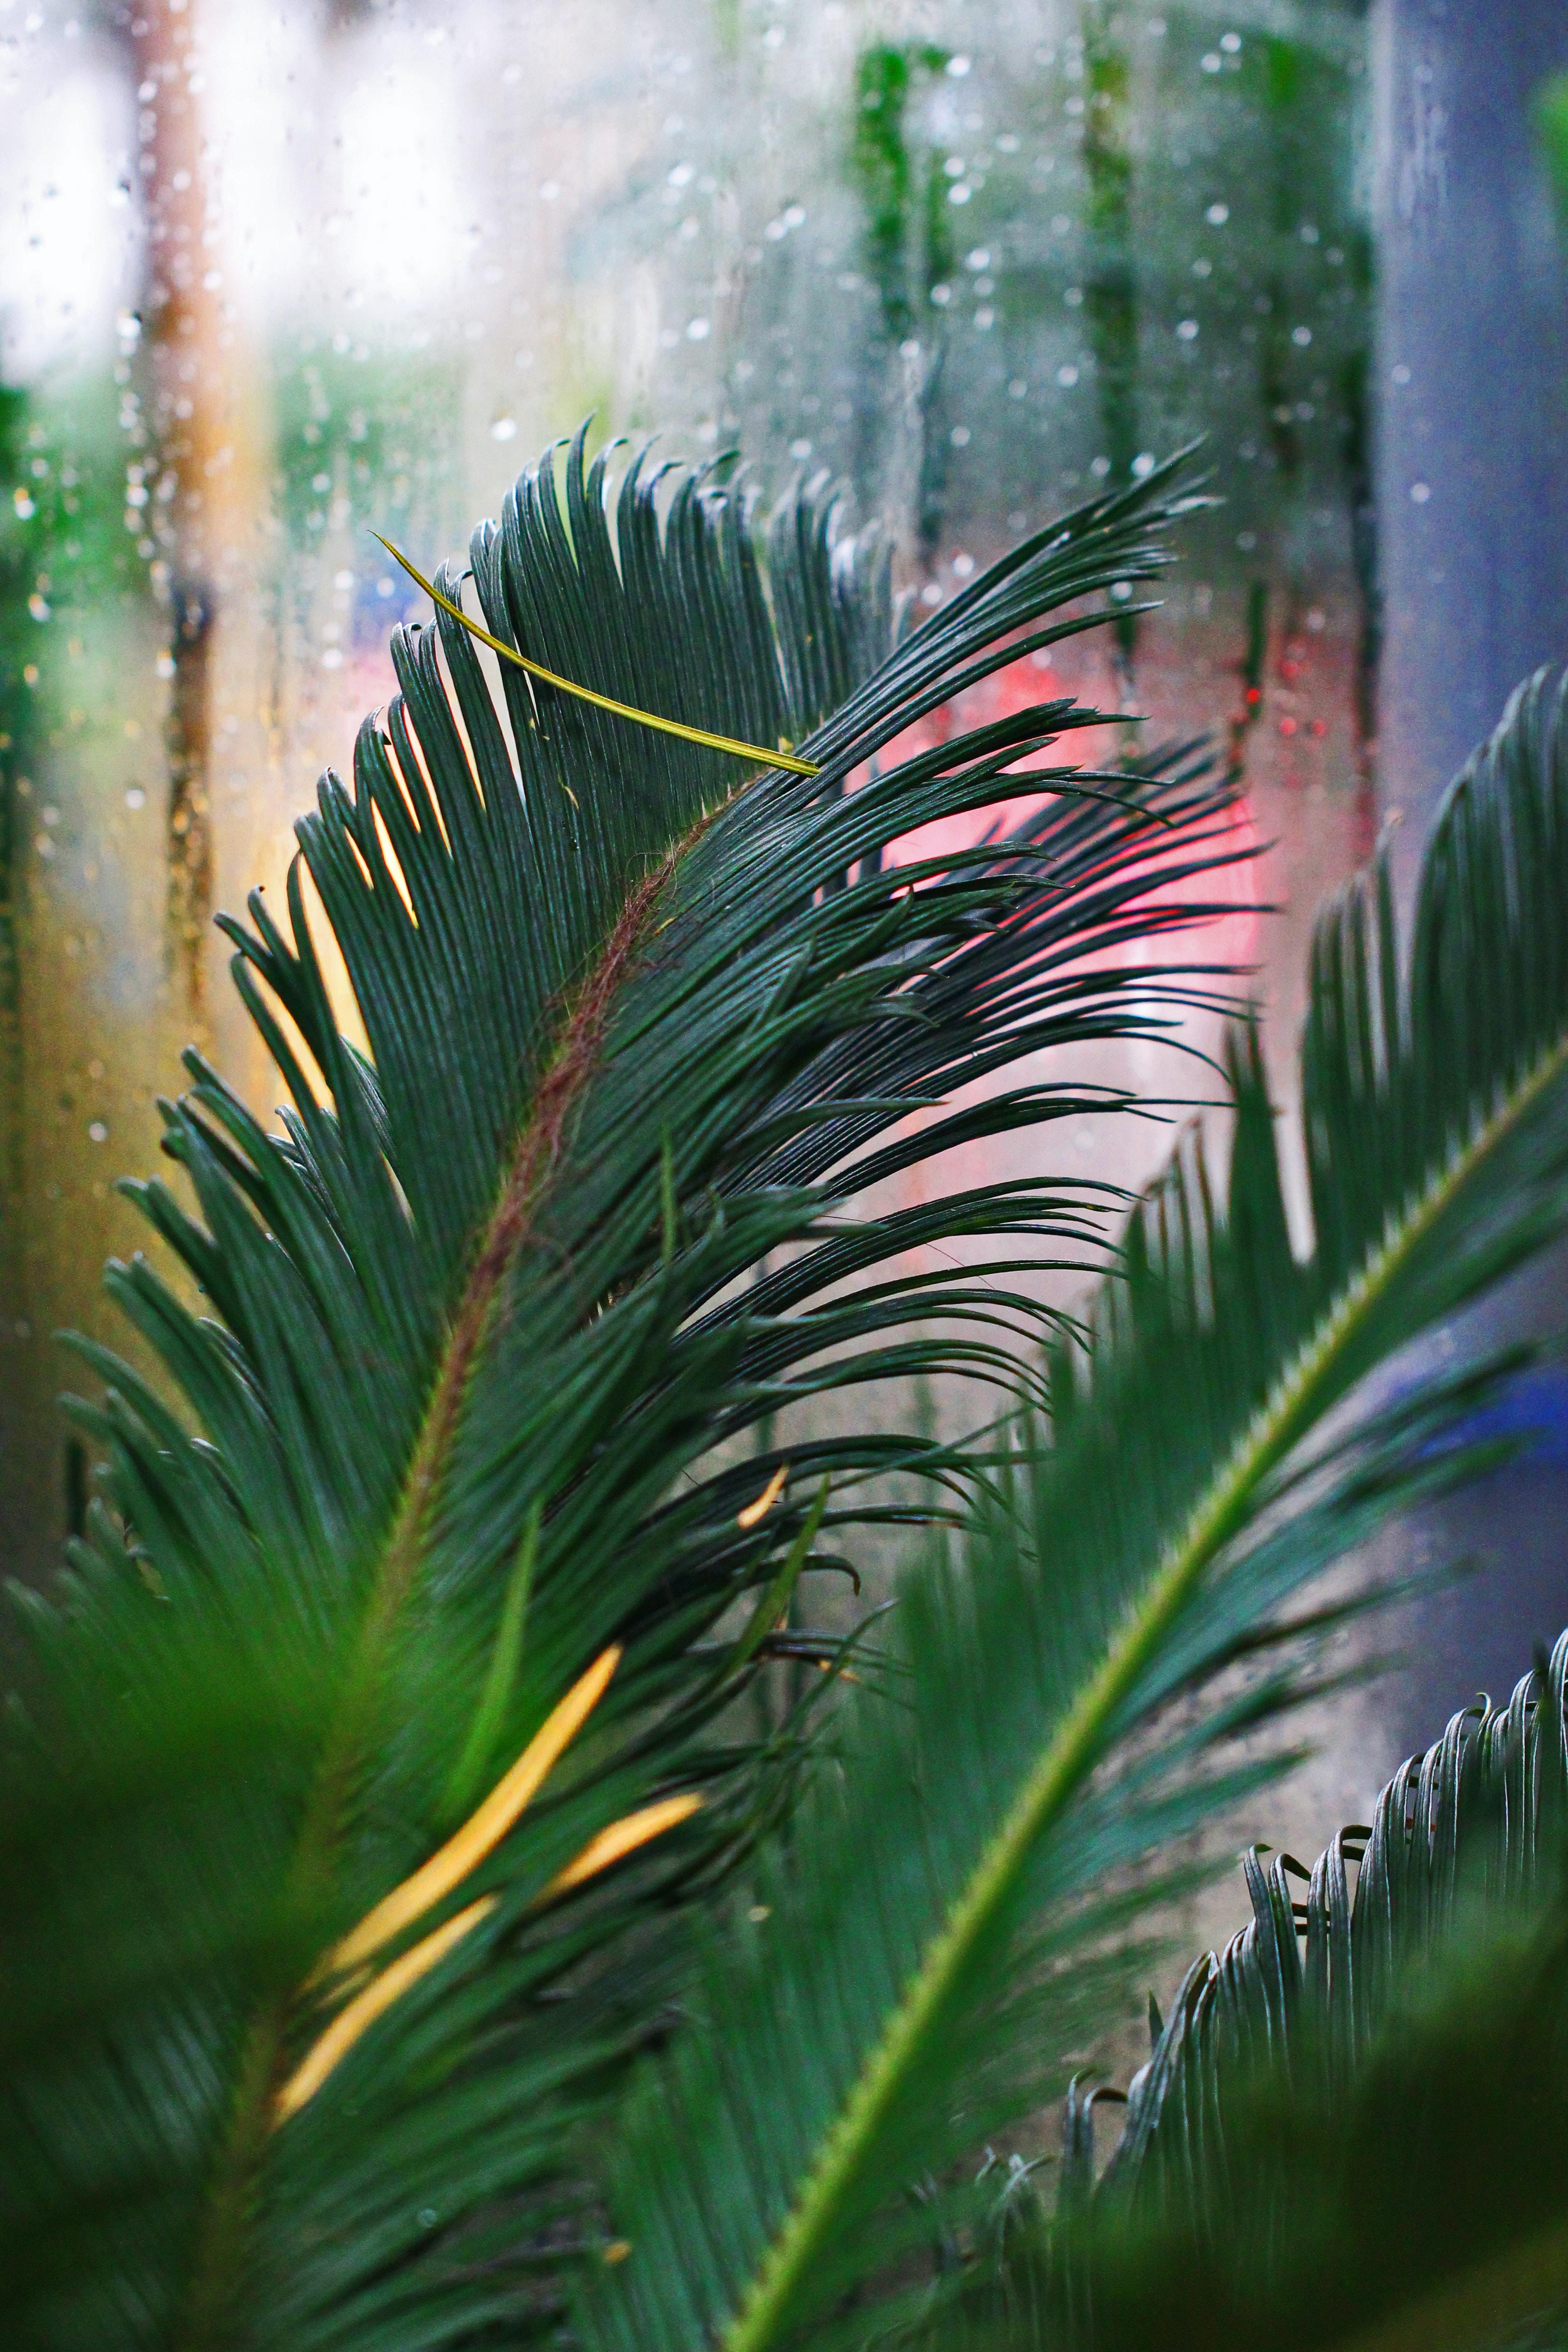 green sago palm tree closeup photography